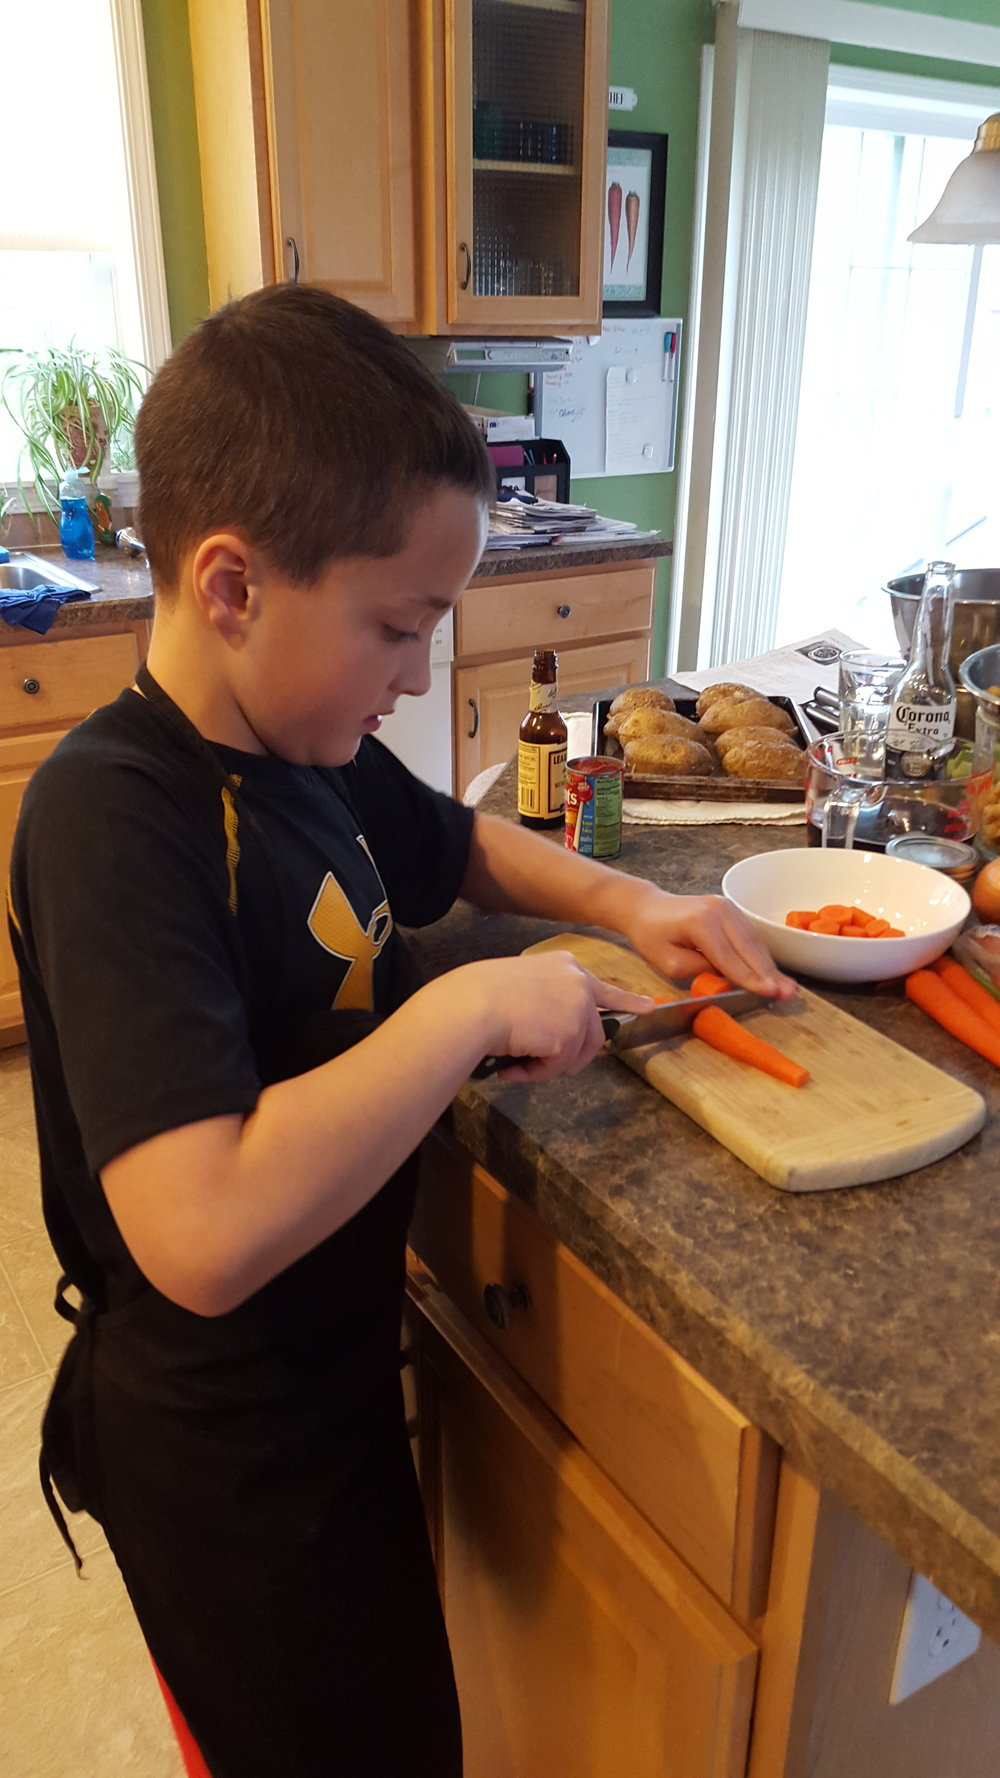 Cutting carrots Josh.jpg